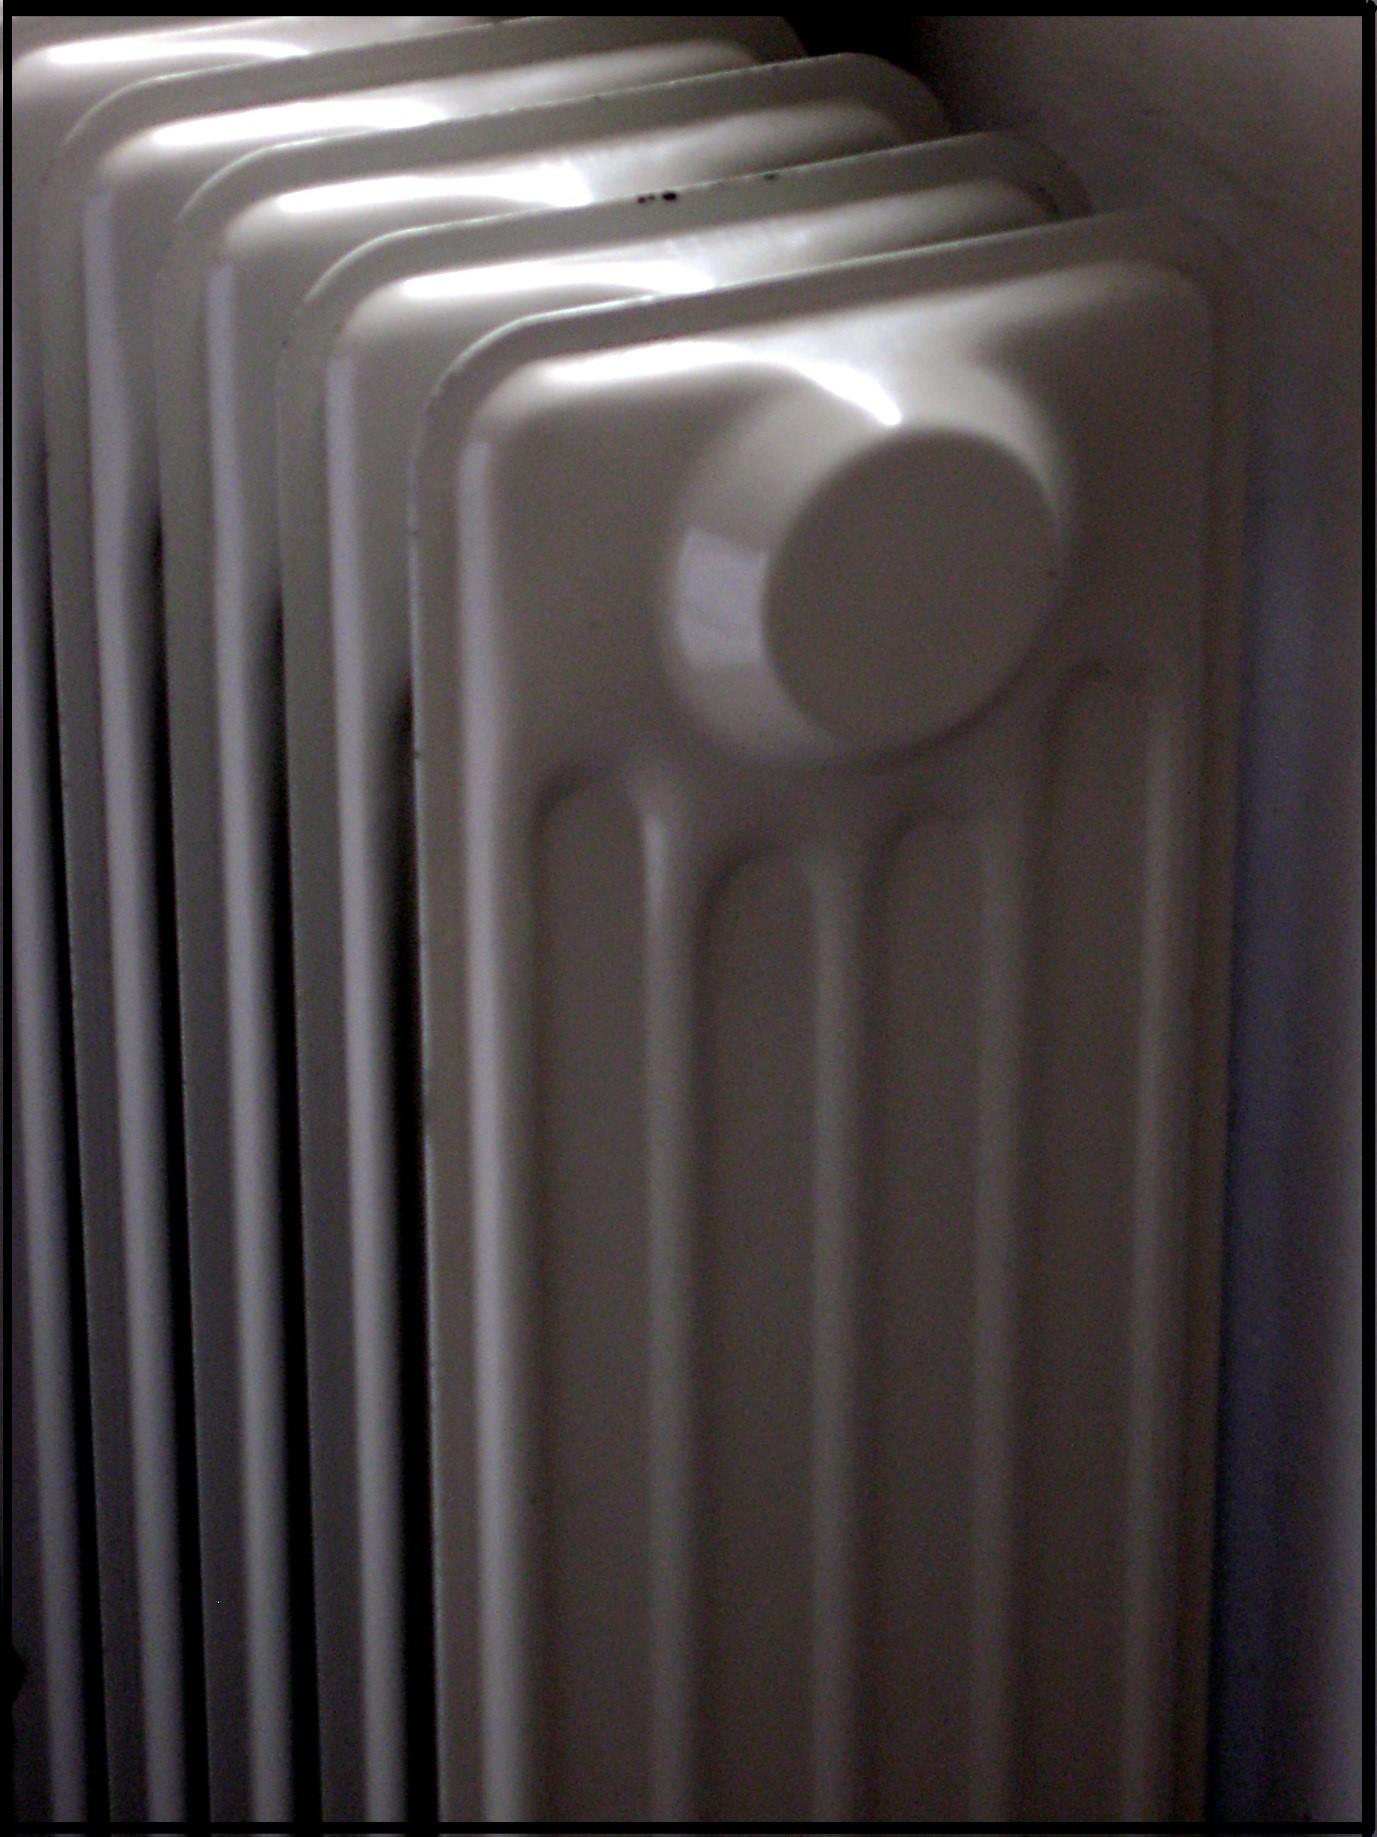 cleaning radiators plumbing repairs 24 7 home rescue. Black Bedroom Furniture Sets. Home Design Ideas